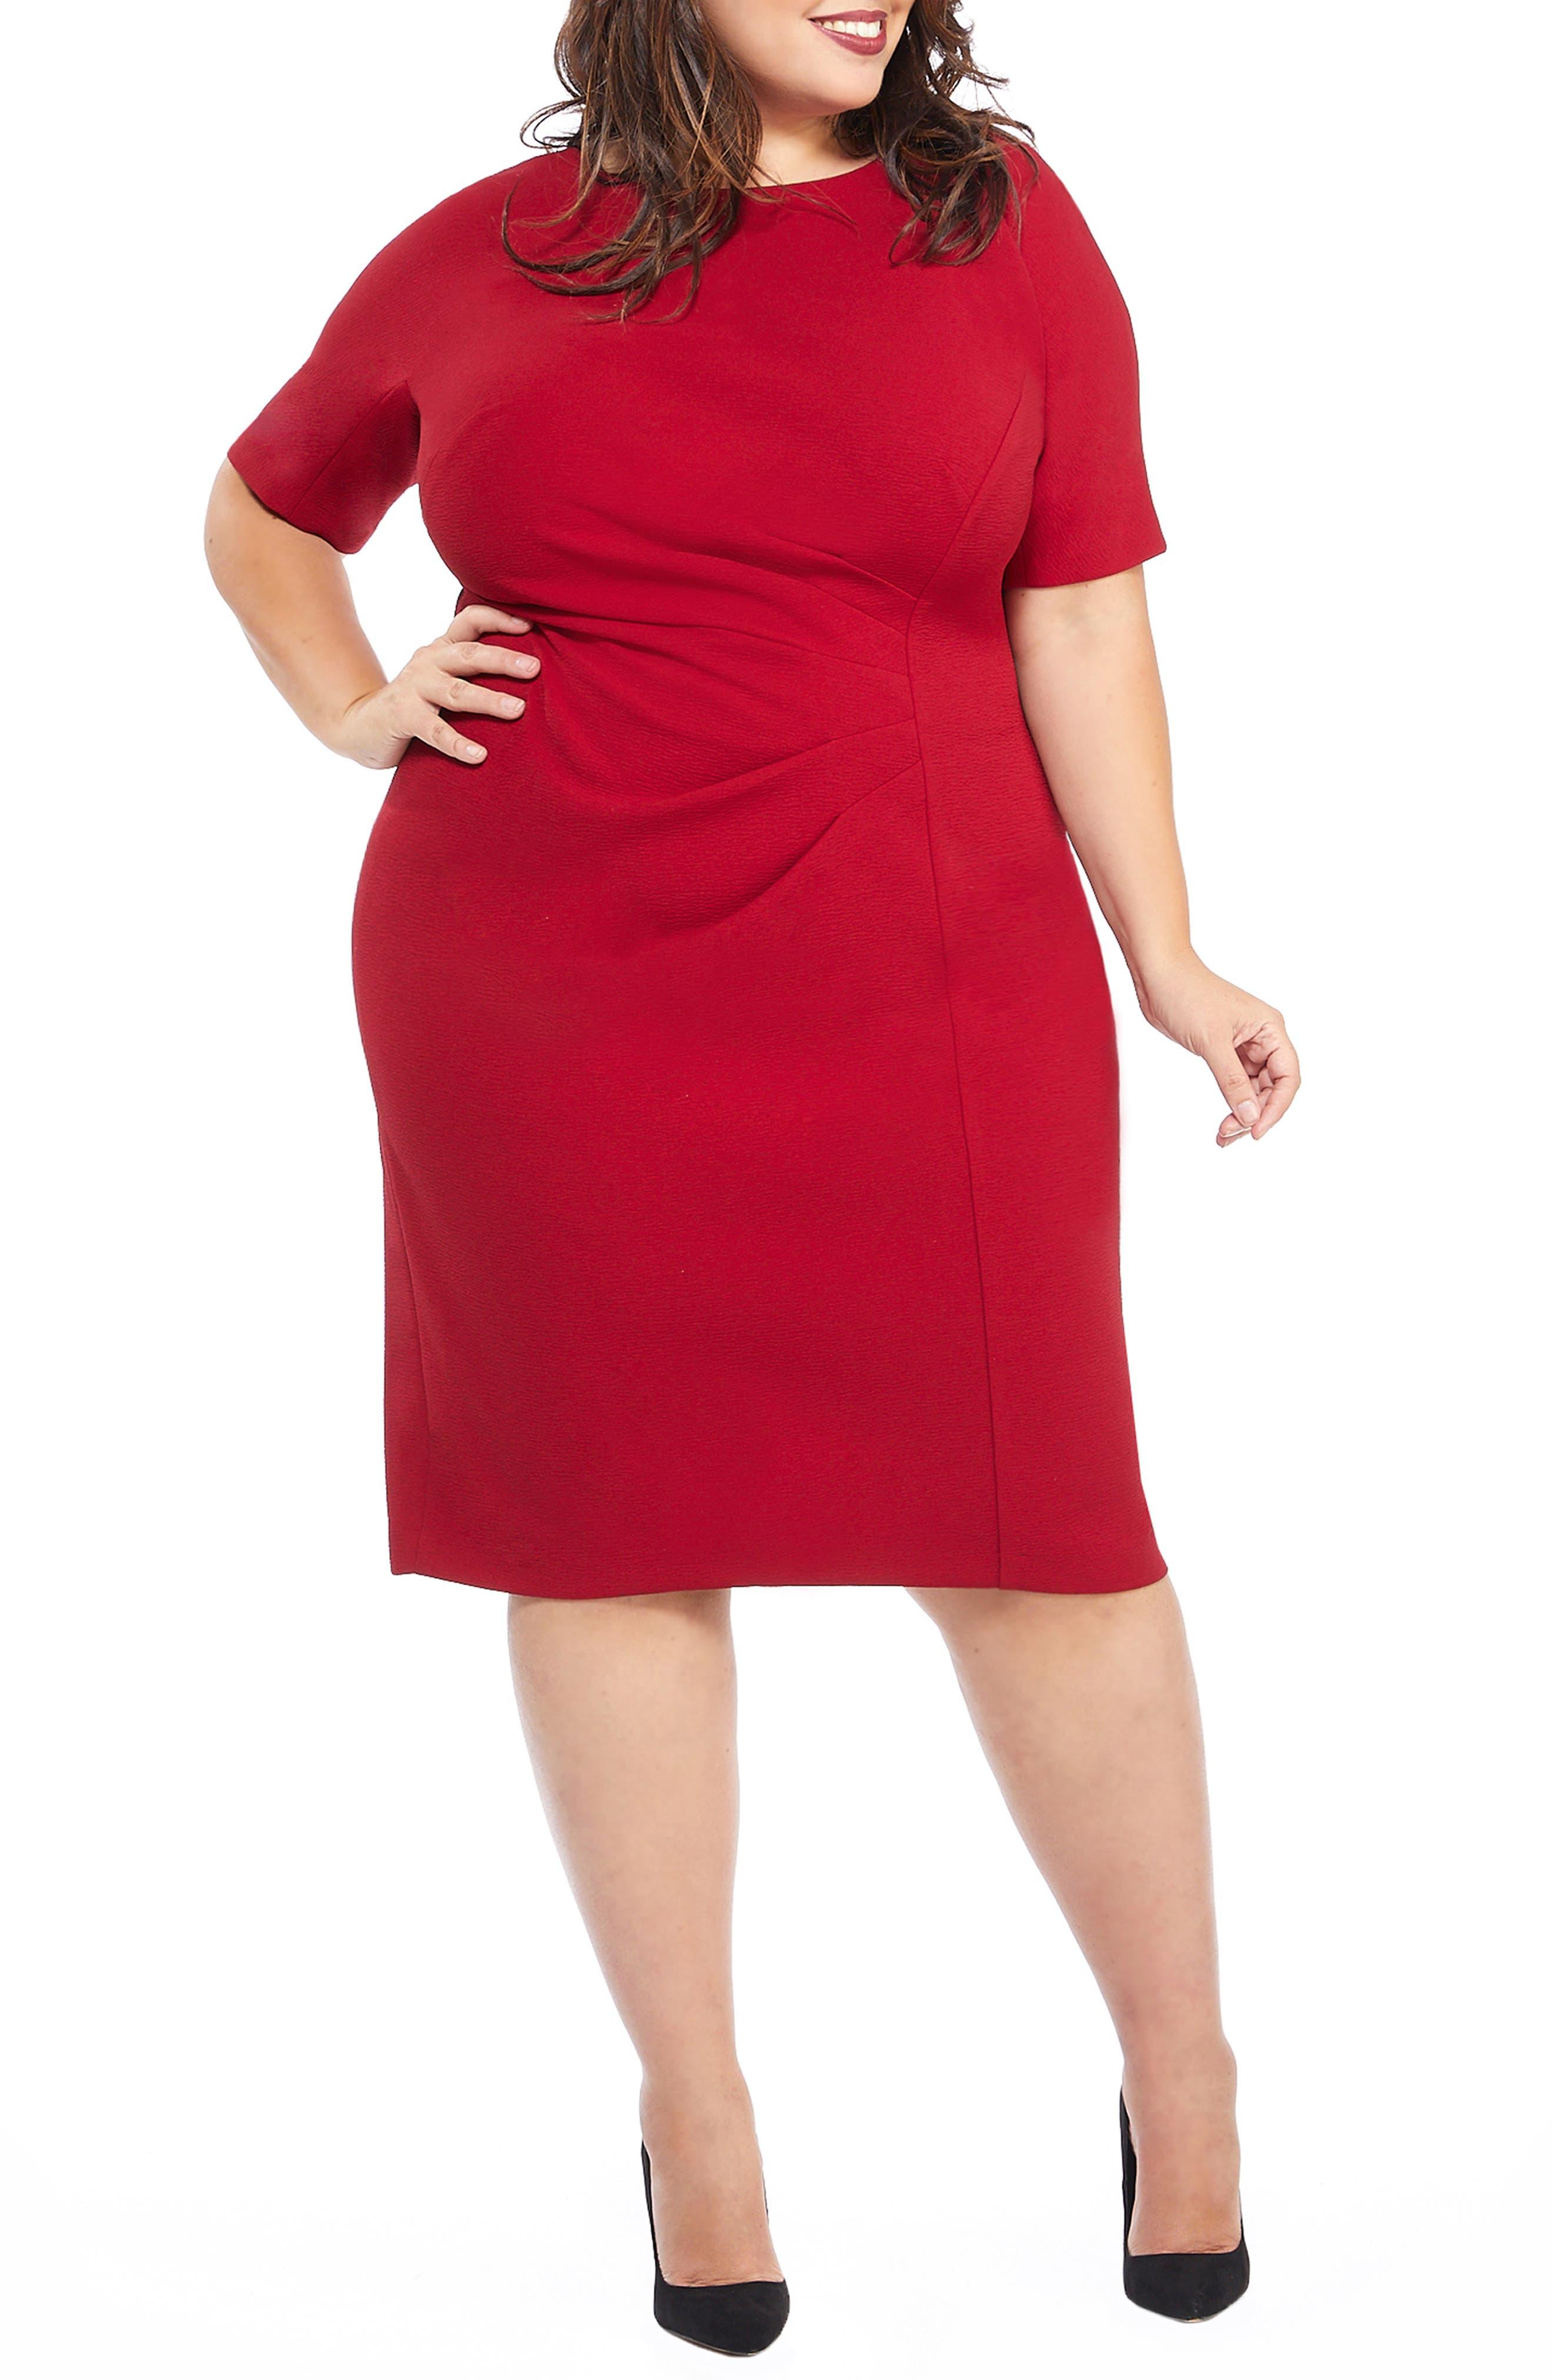 Metro Draped Side Sheath Dress,                             Main thumbnail 1, color,                             RED